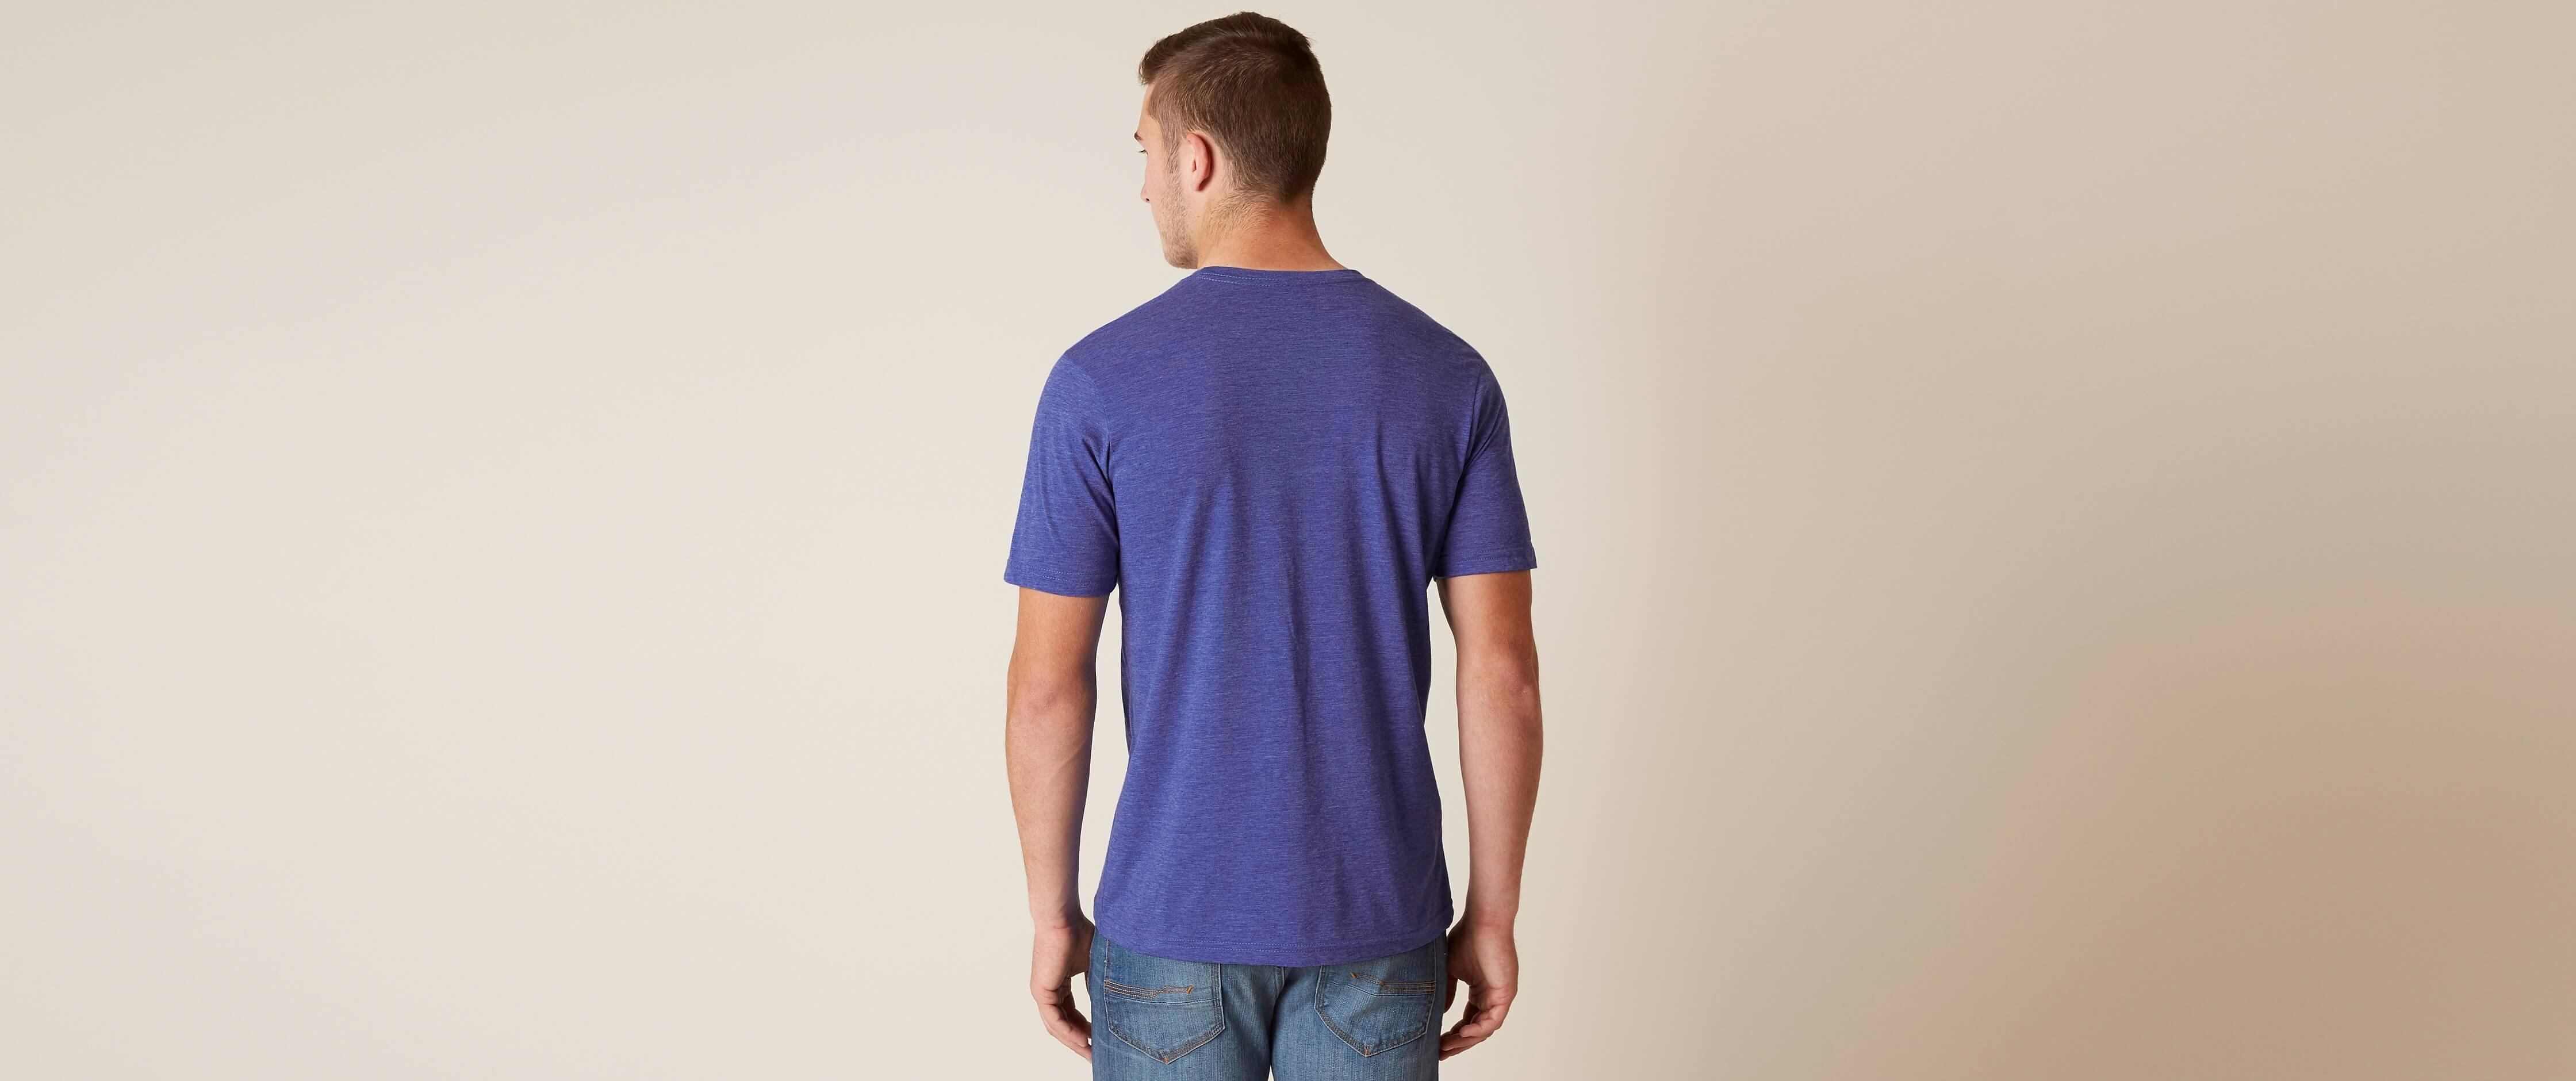 2b987fd16 Tumbleweed TexStyles Texas Towns T-Shirt [6XuXh0608895] - $32.99